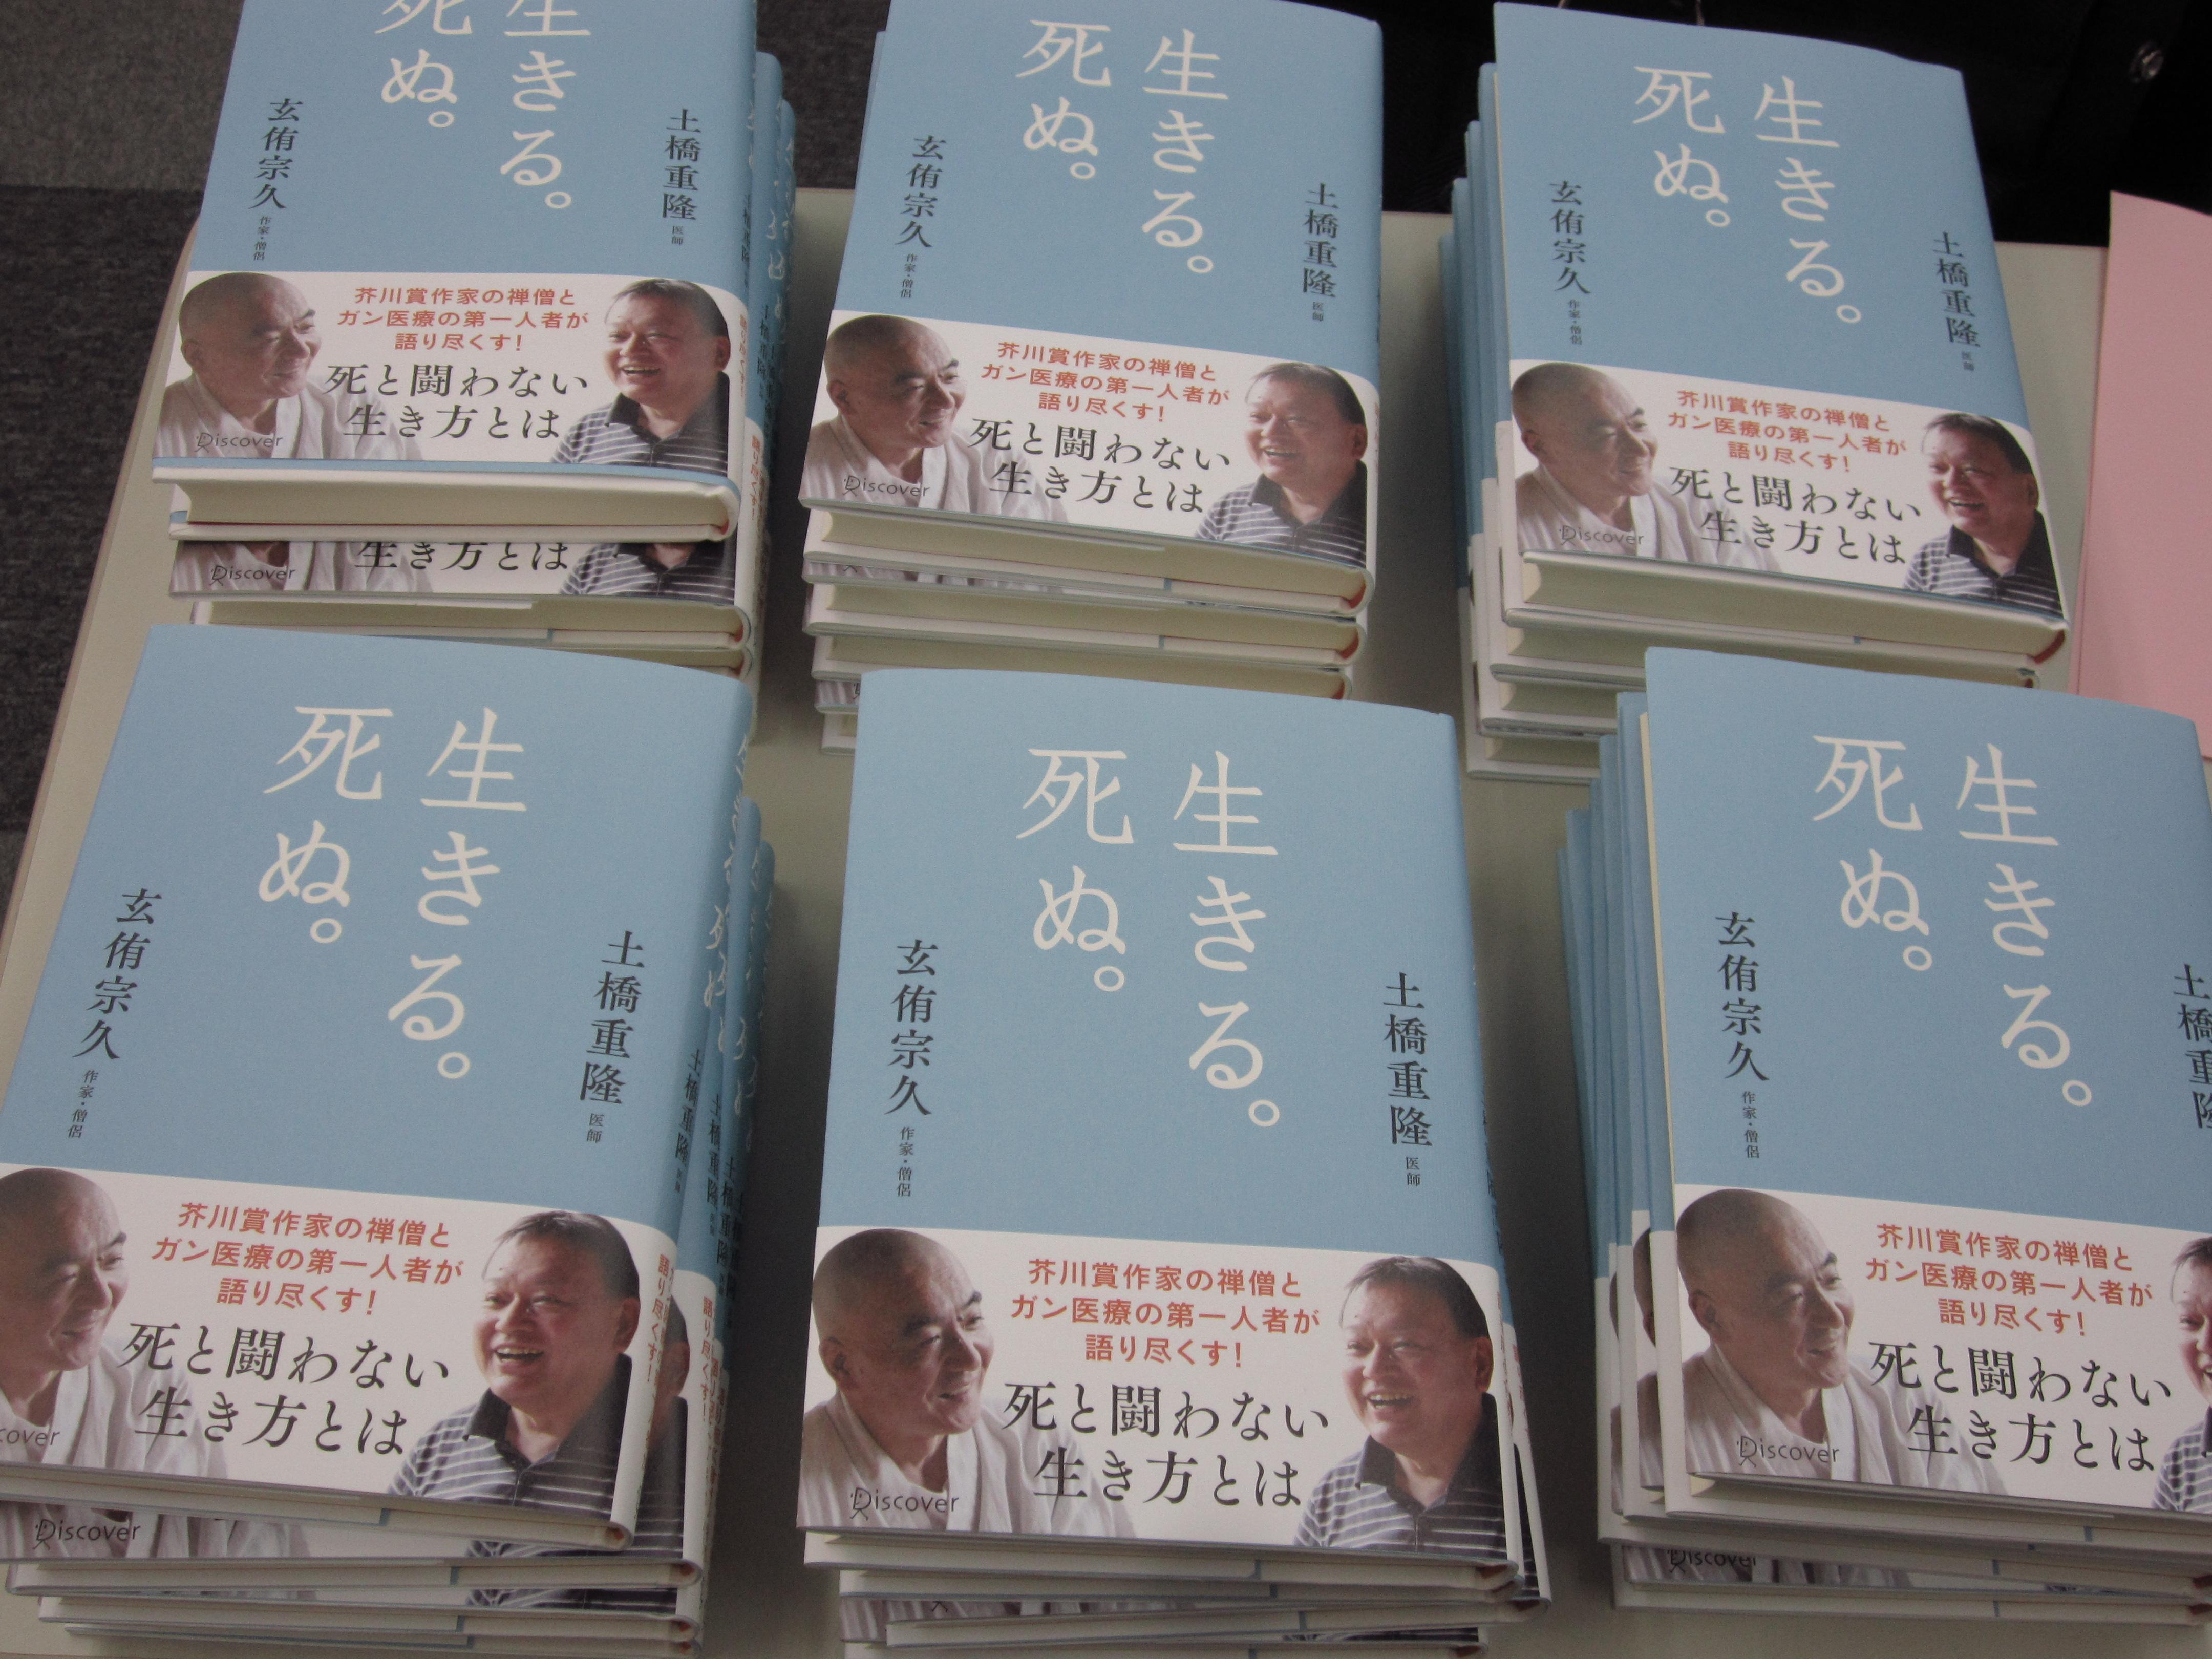 IMG 5611 - 4月1日東京思風塾の開催になります。